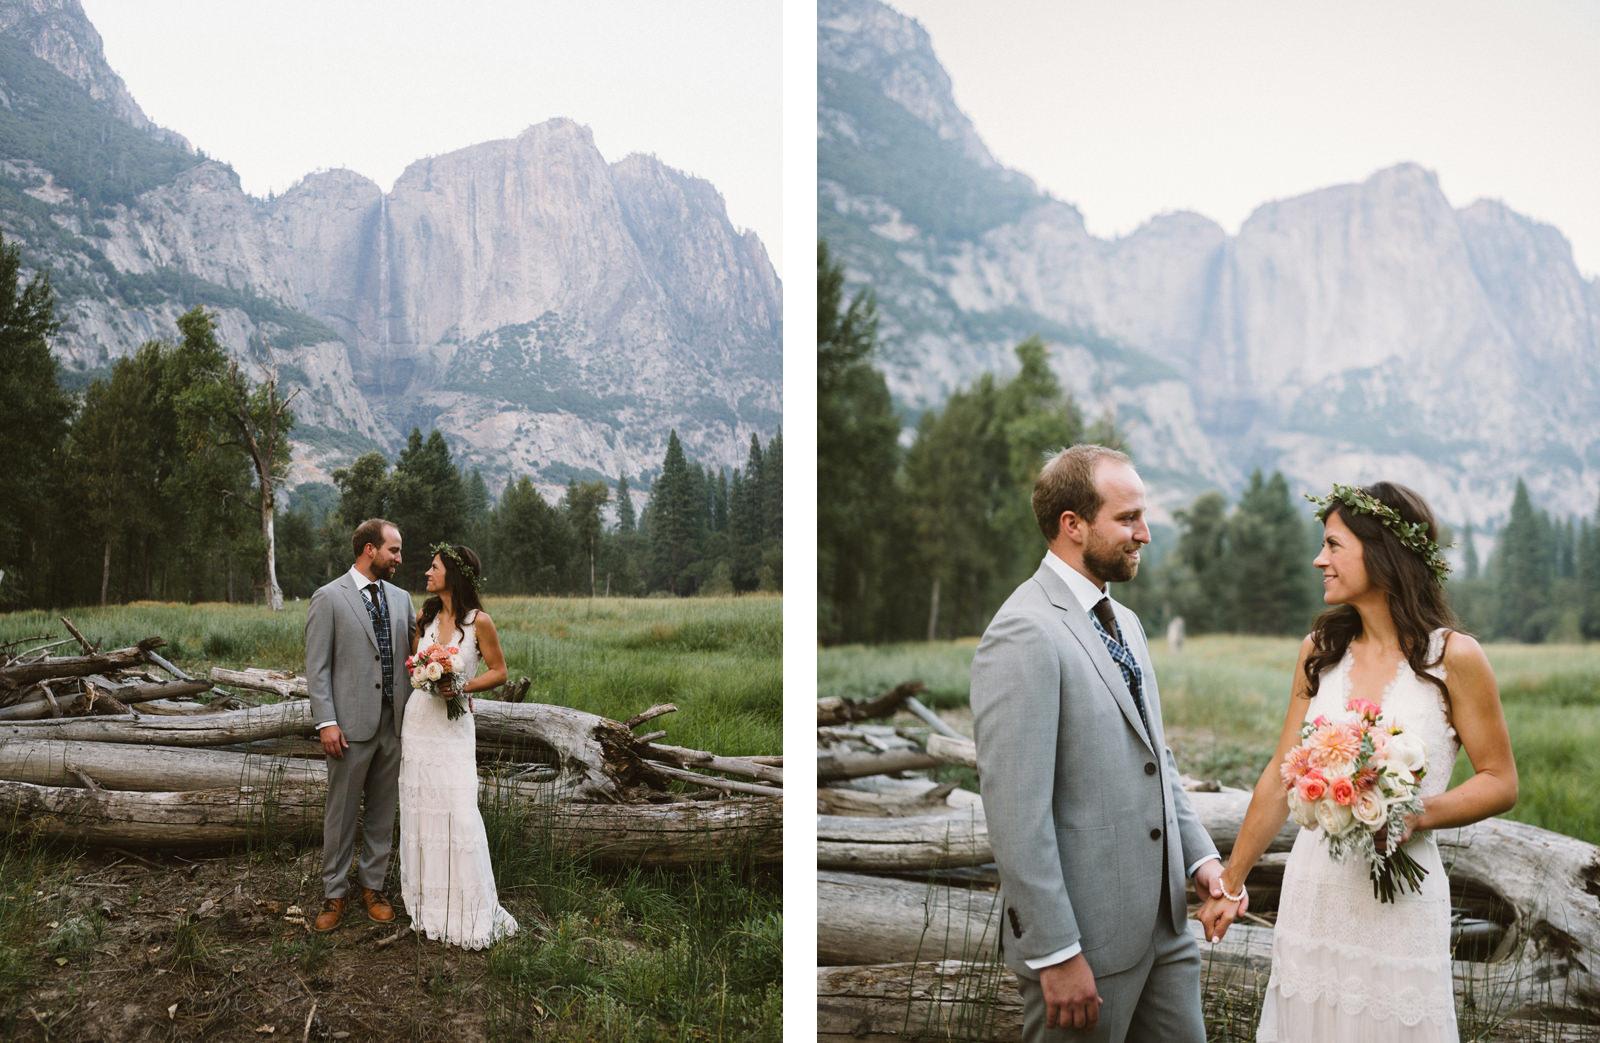 yosemite-intimate-wedding-081 YOSEMITE INTIMATE WEDDING